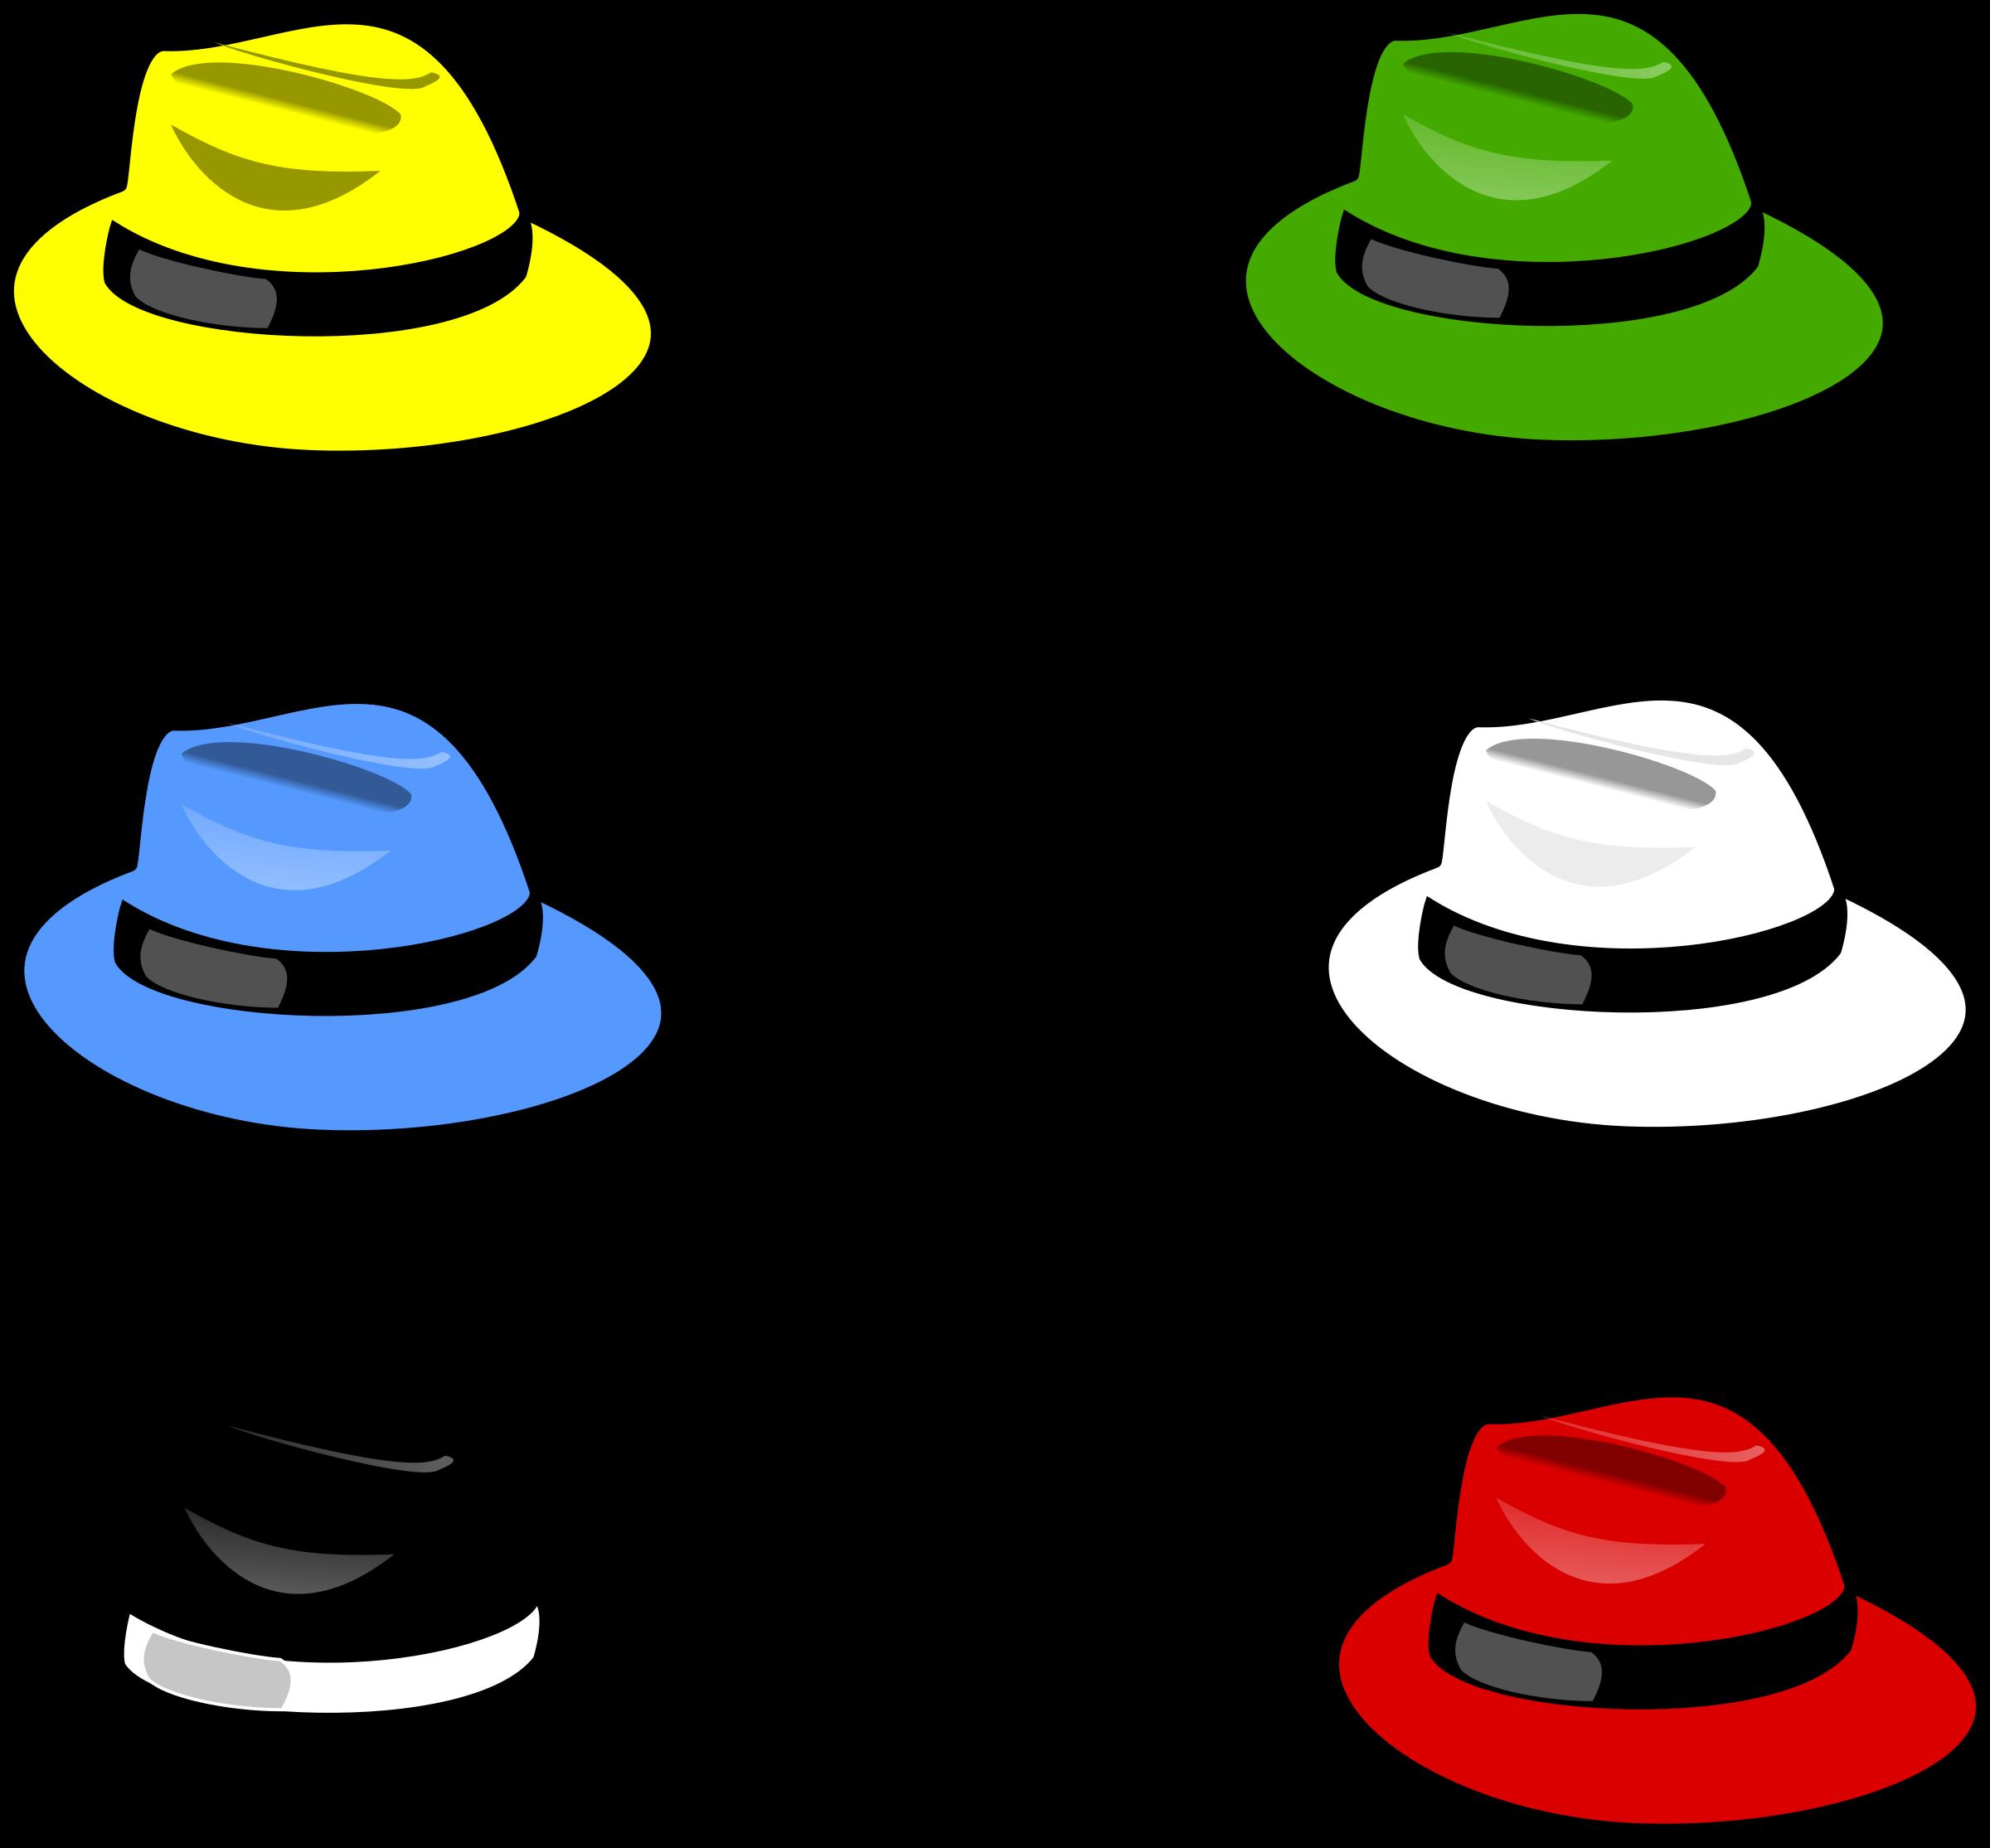 Detective clipart detective hat. Six hats big image